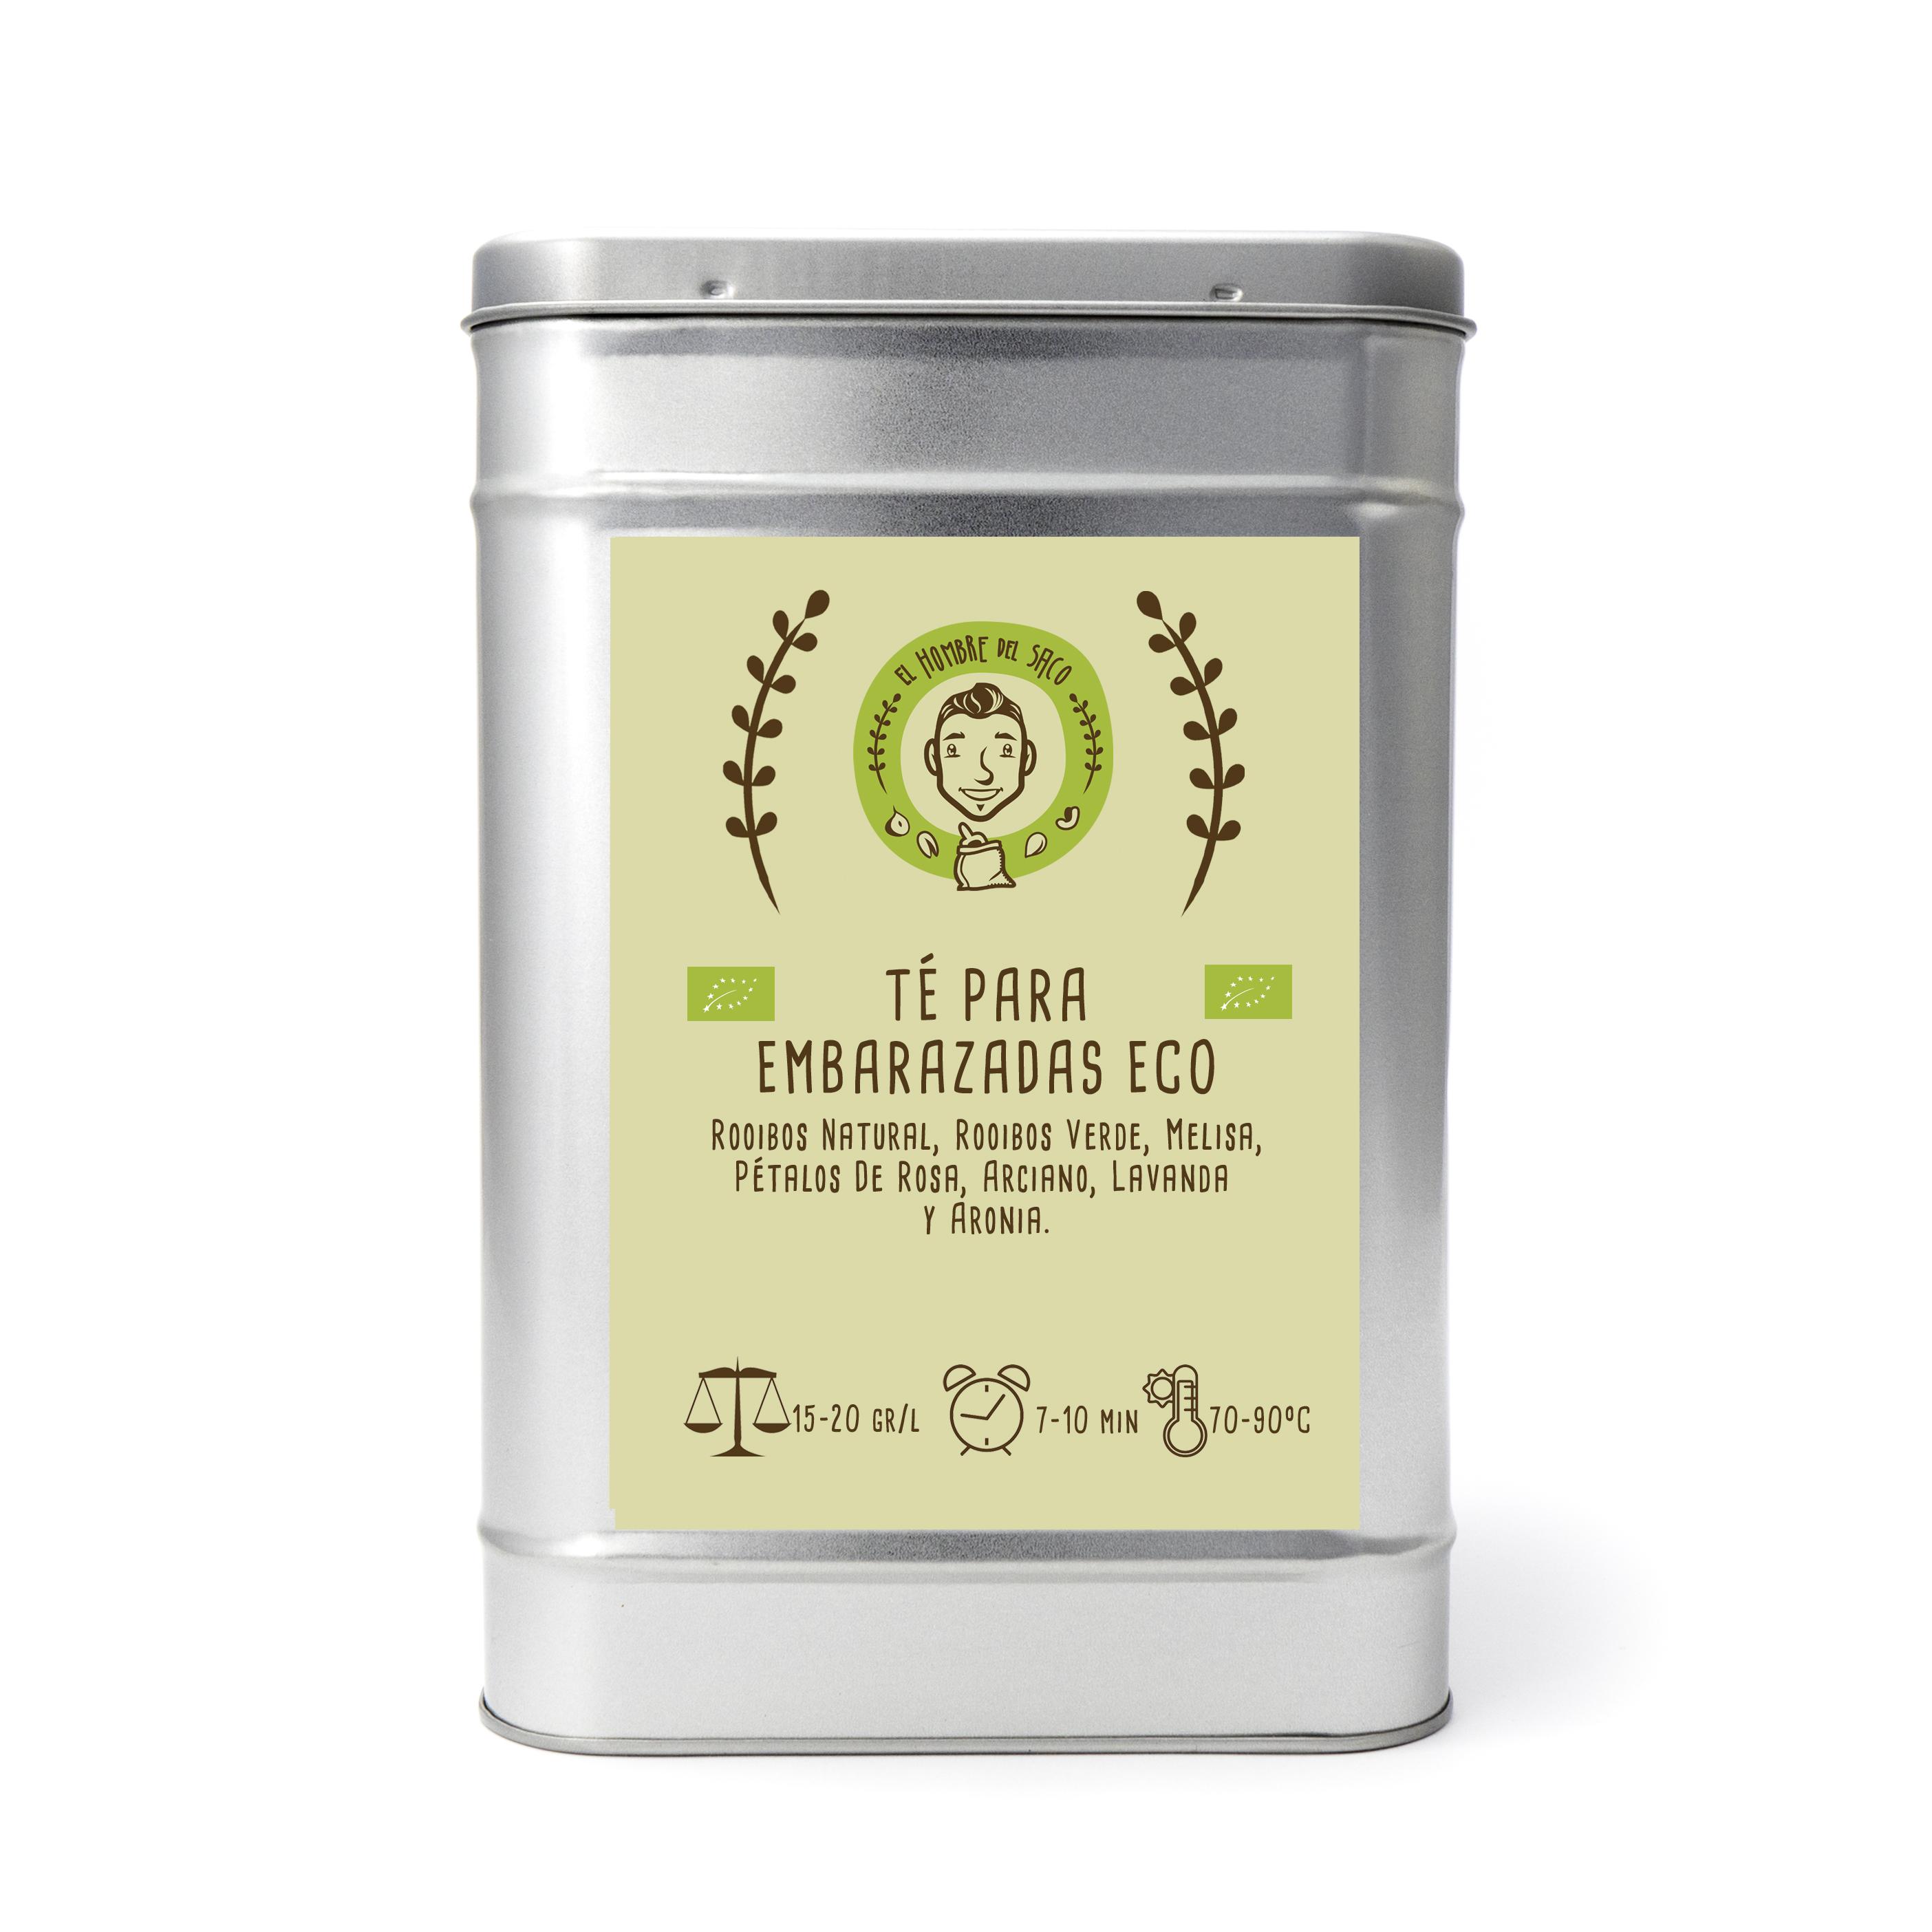 Té para embarazadas ecológico